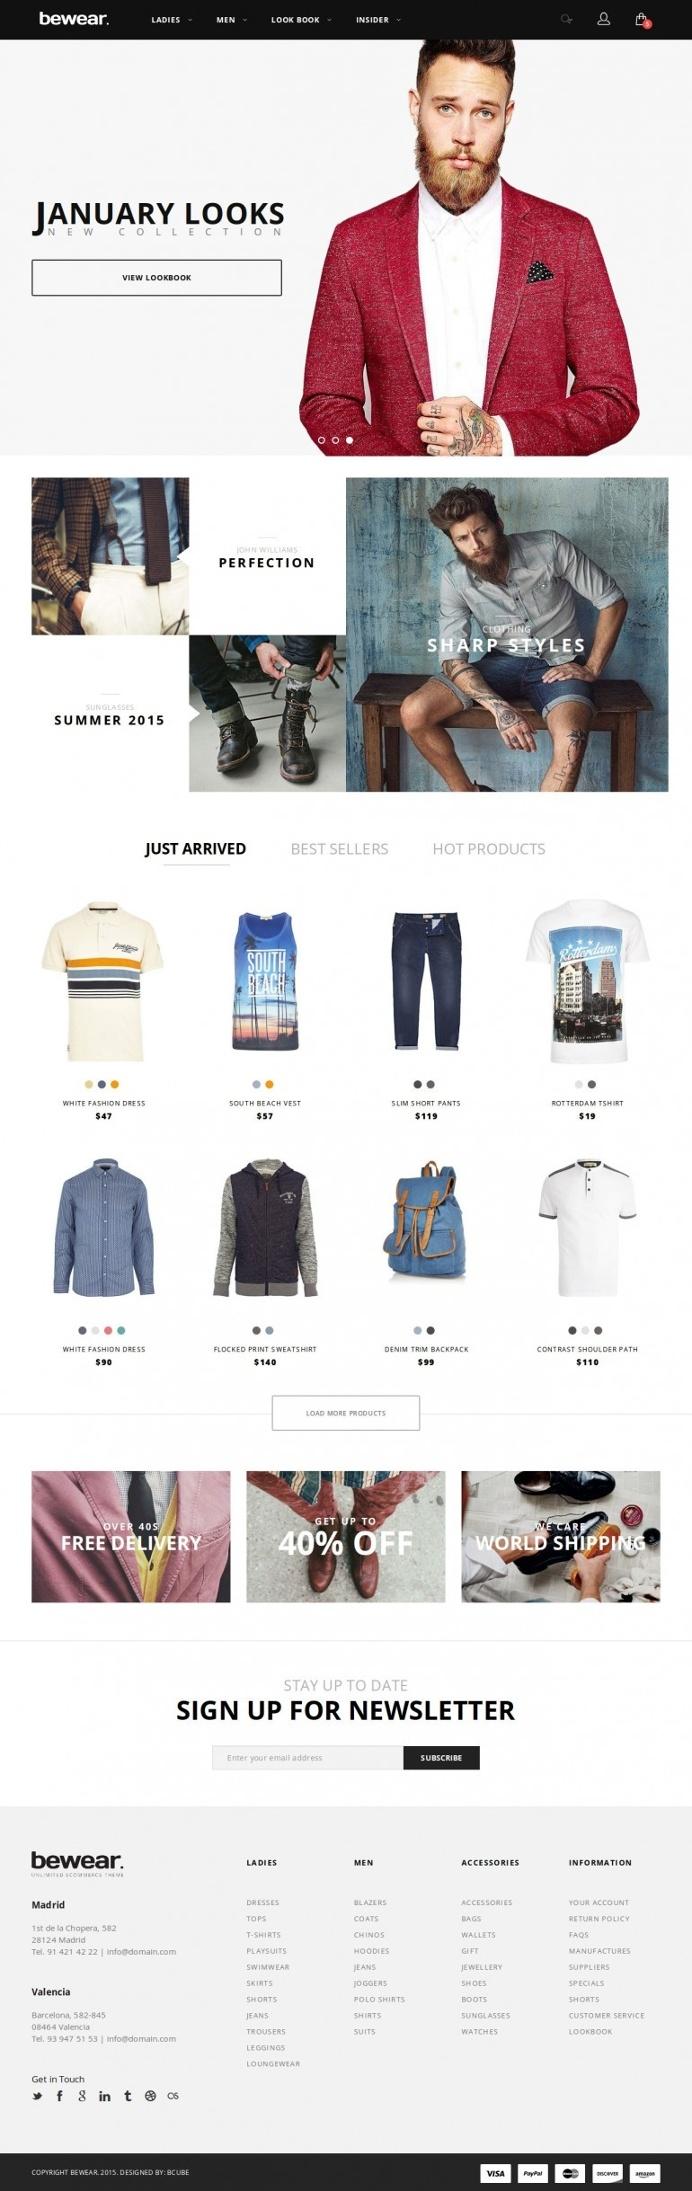 Bewear – Fashion LookBook